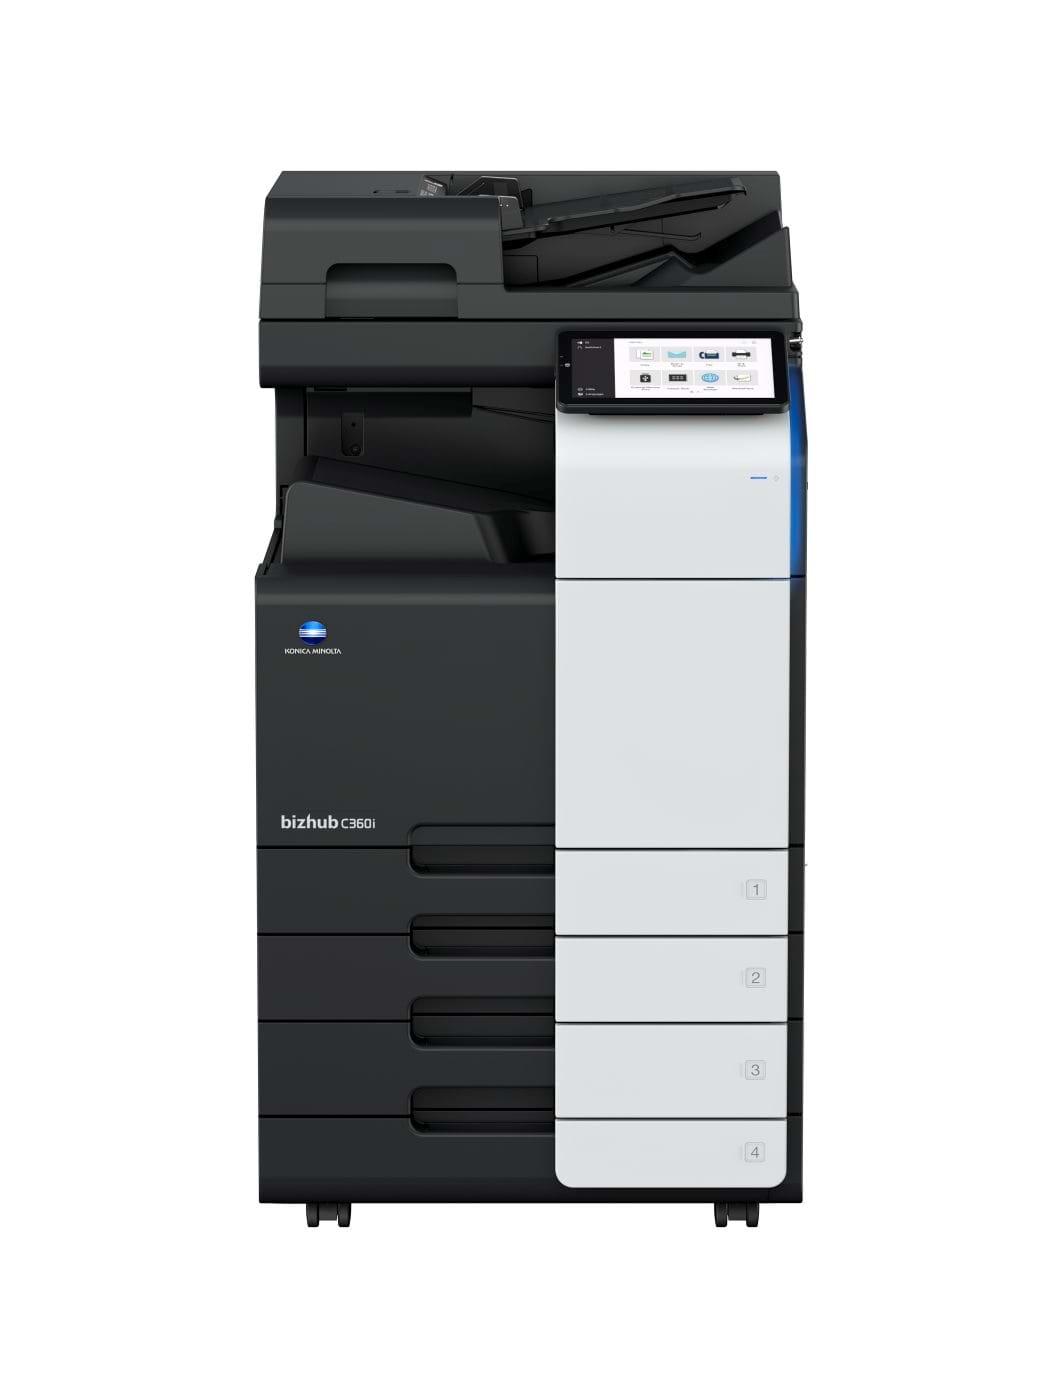 Konica Minolta fotocopiatore Bizhub C250i / C300i / C360i